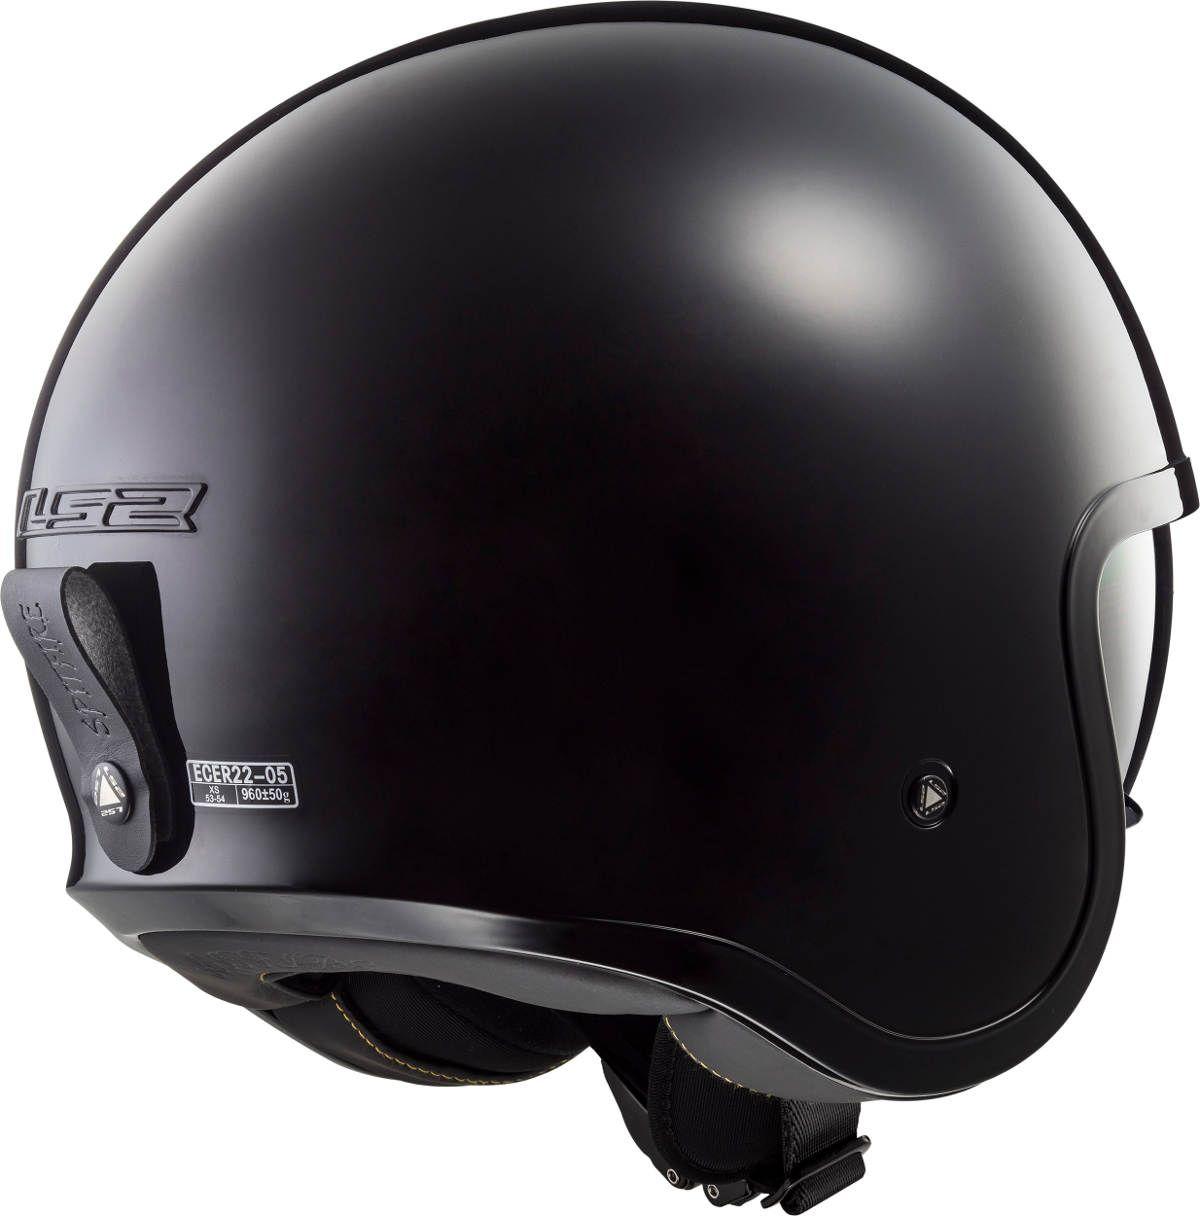 The New Ls2 Spitfire Open Face Motorcycle Helmet Riders Open